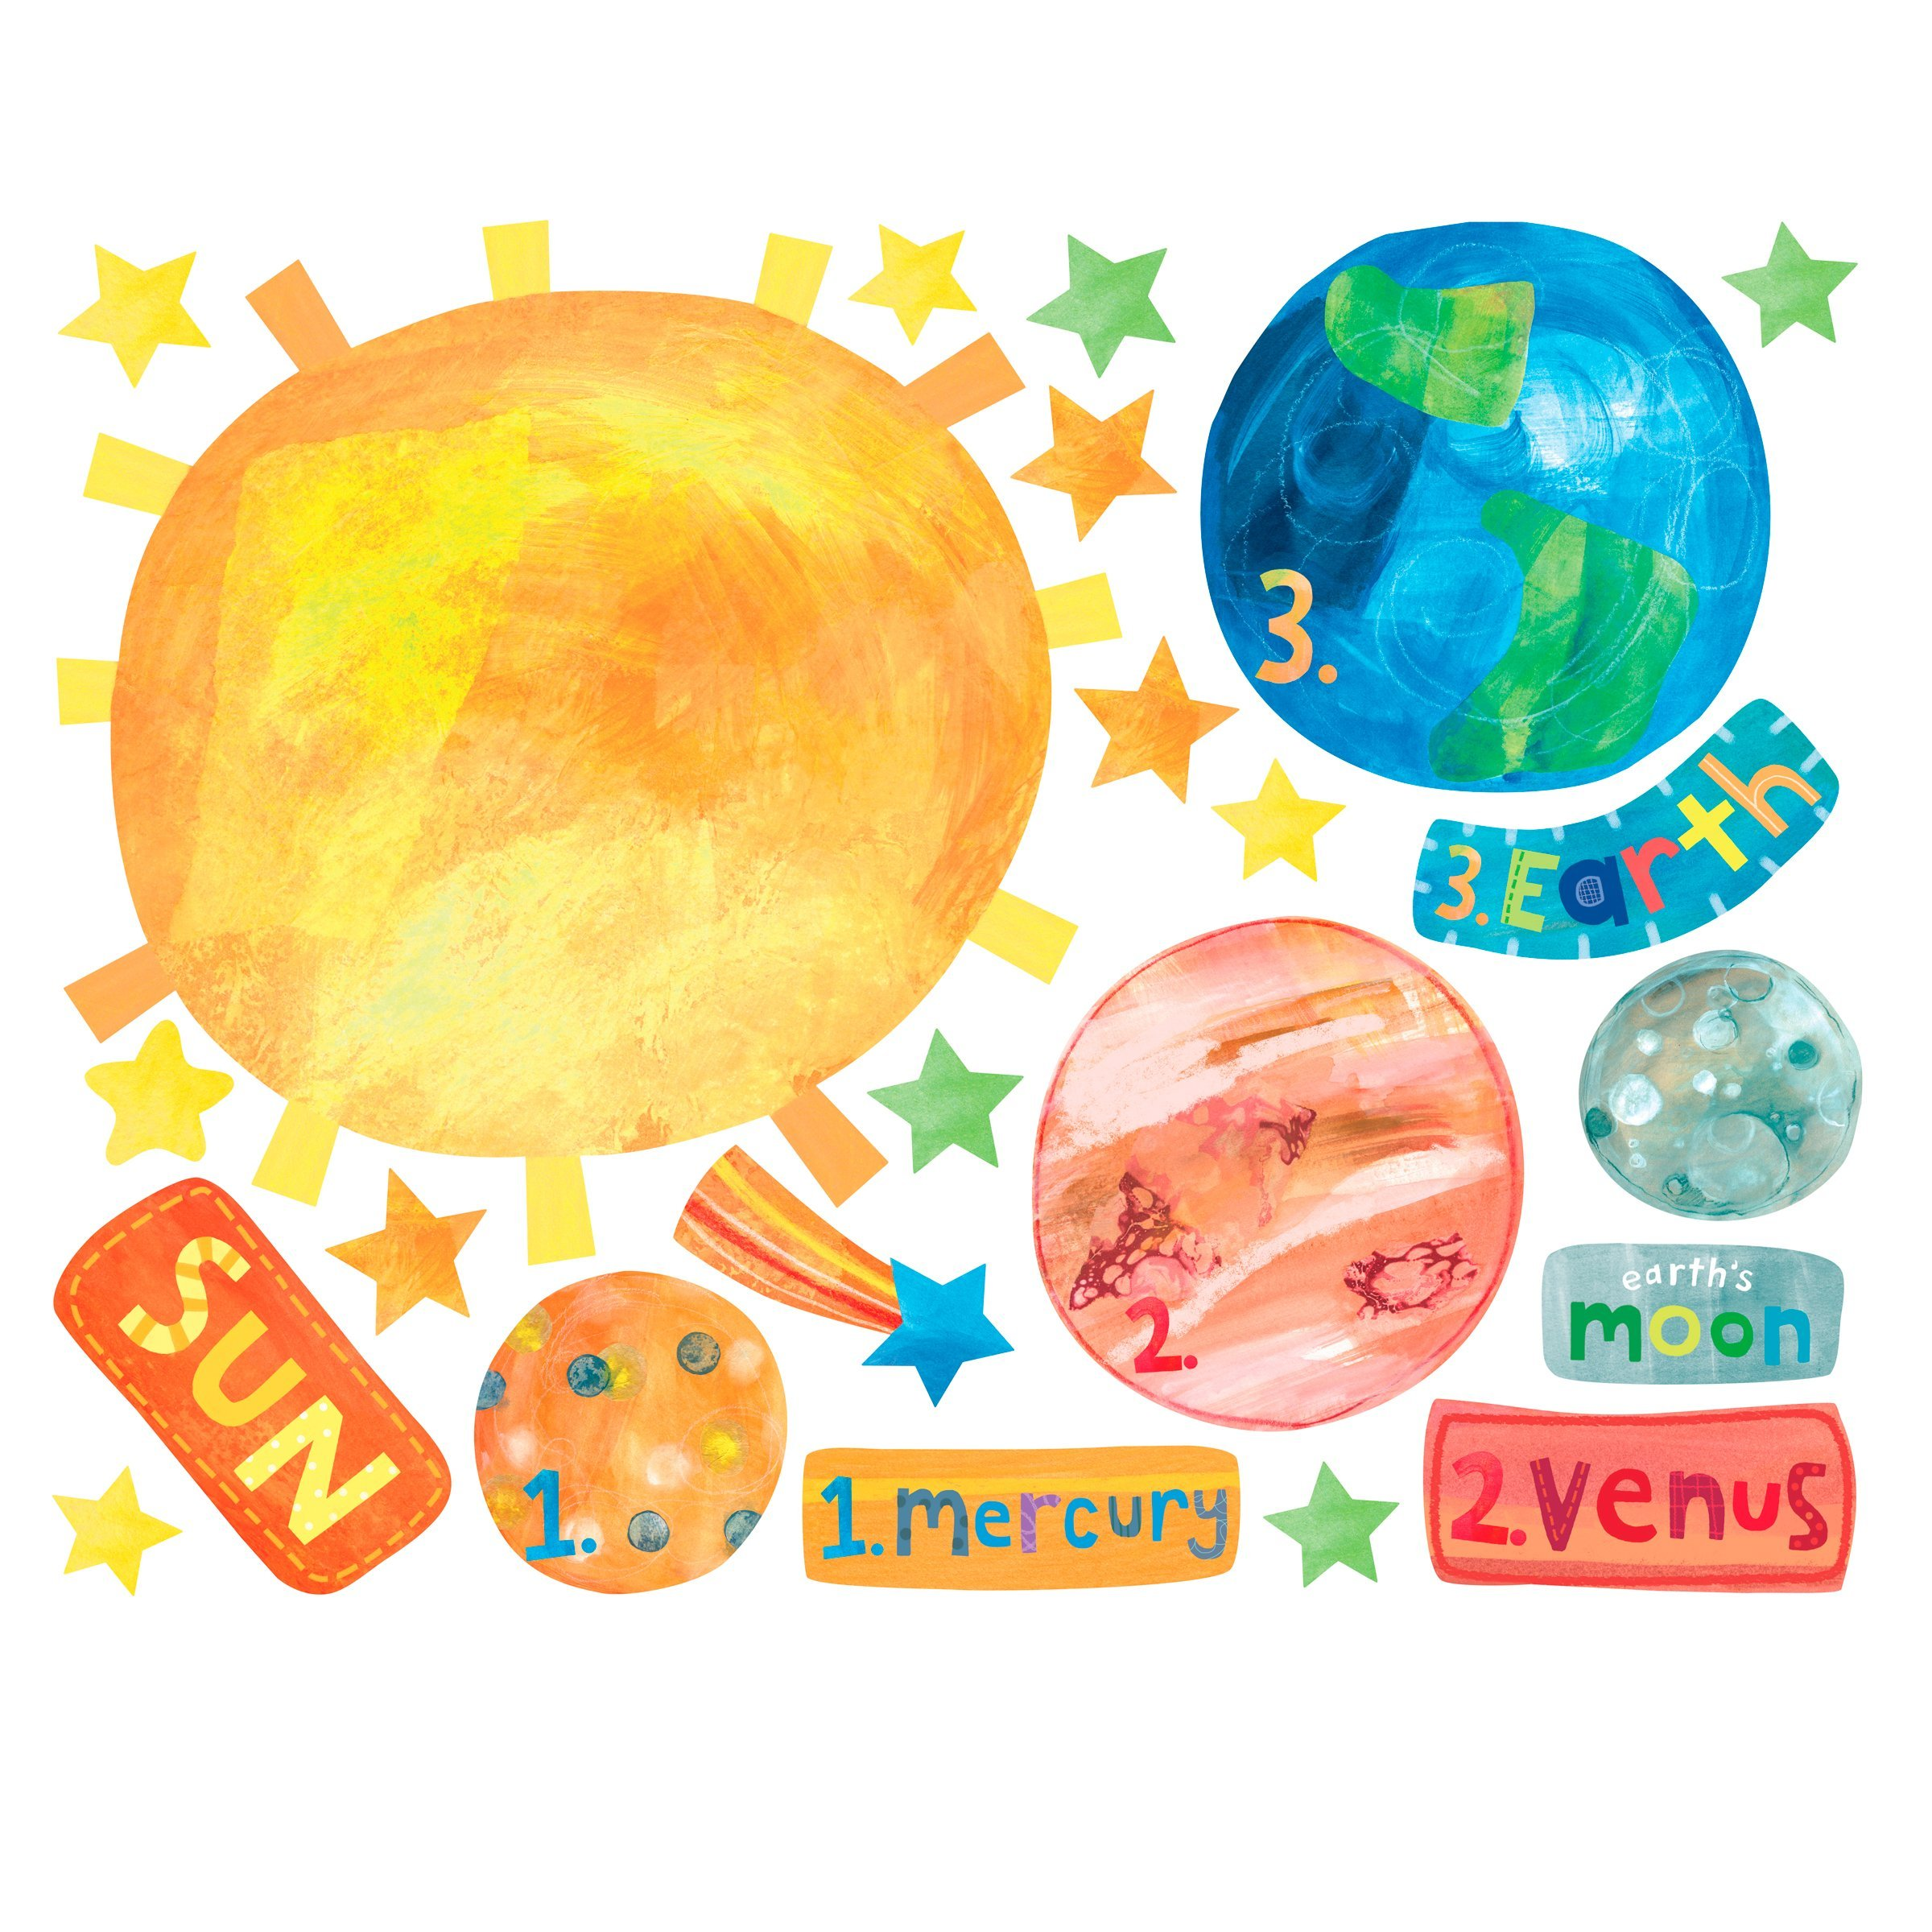 Solar System Wall Stickers: Amazon.co.uk